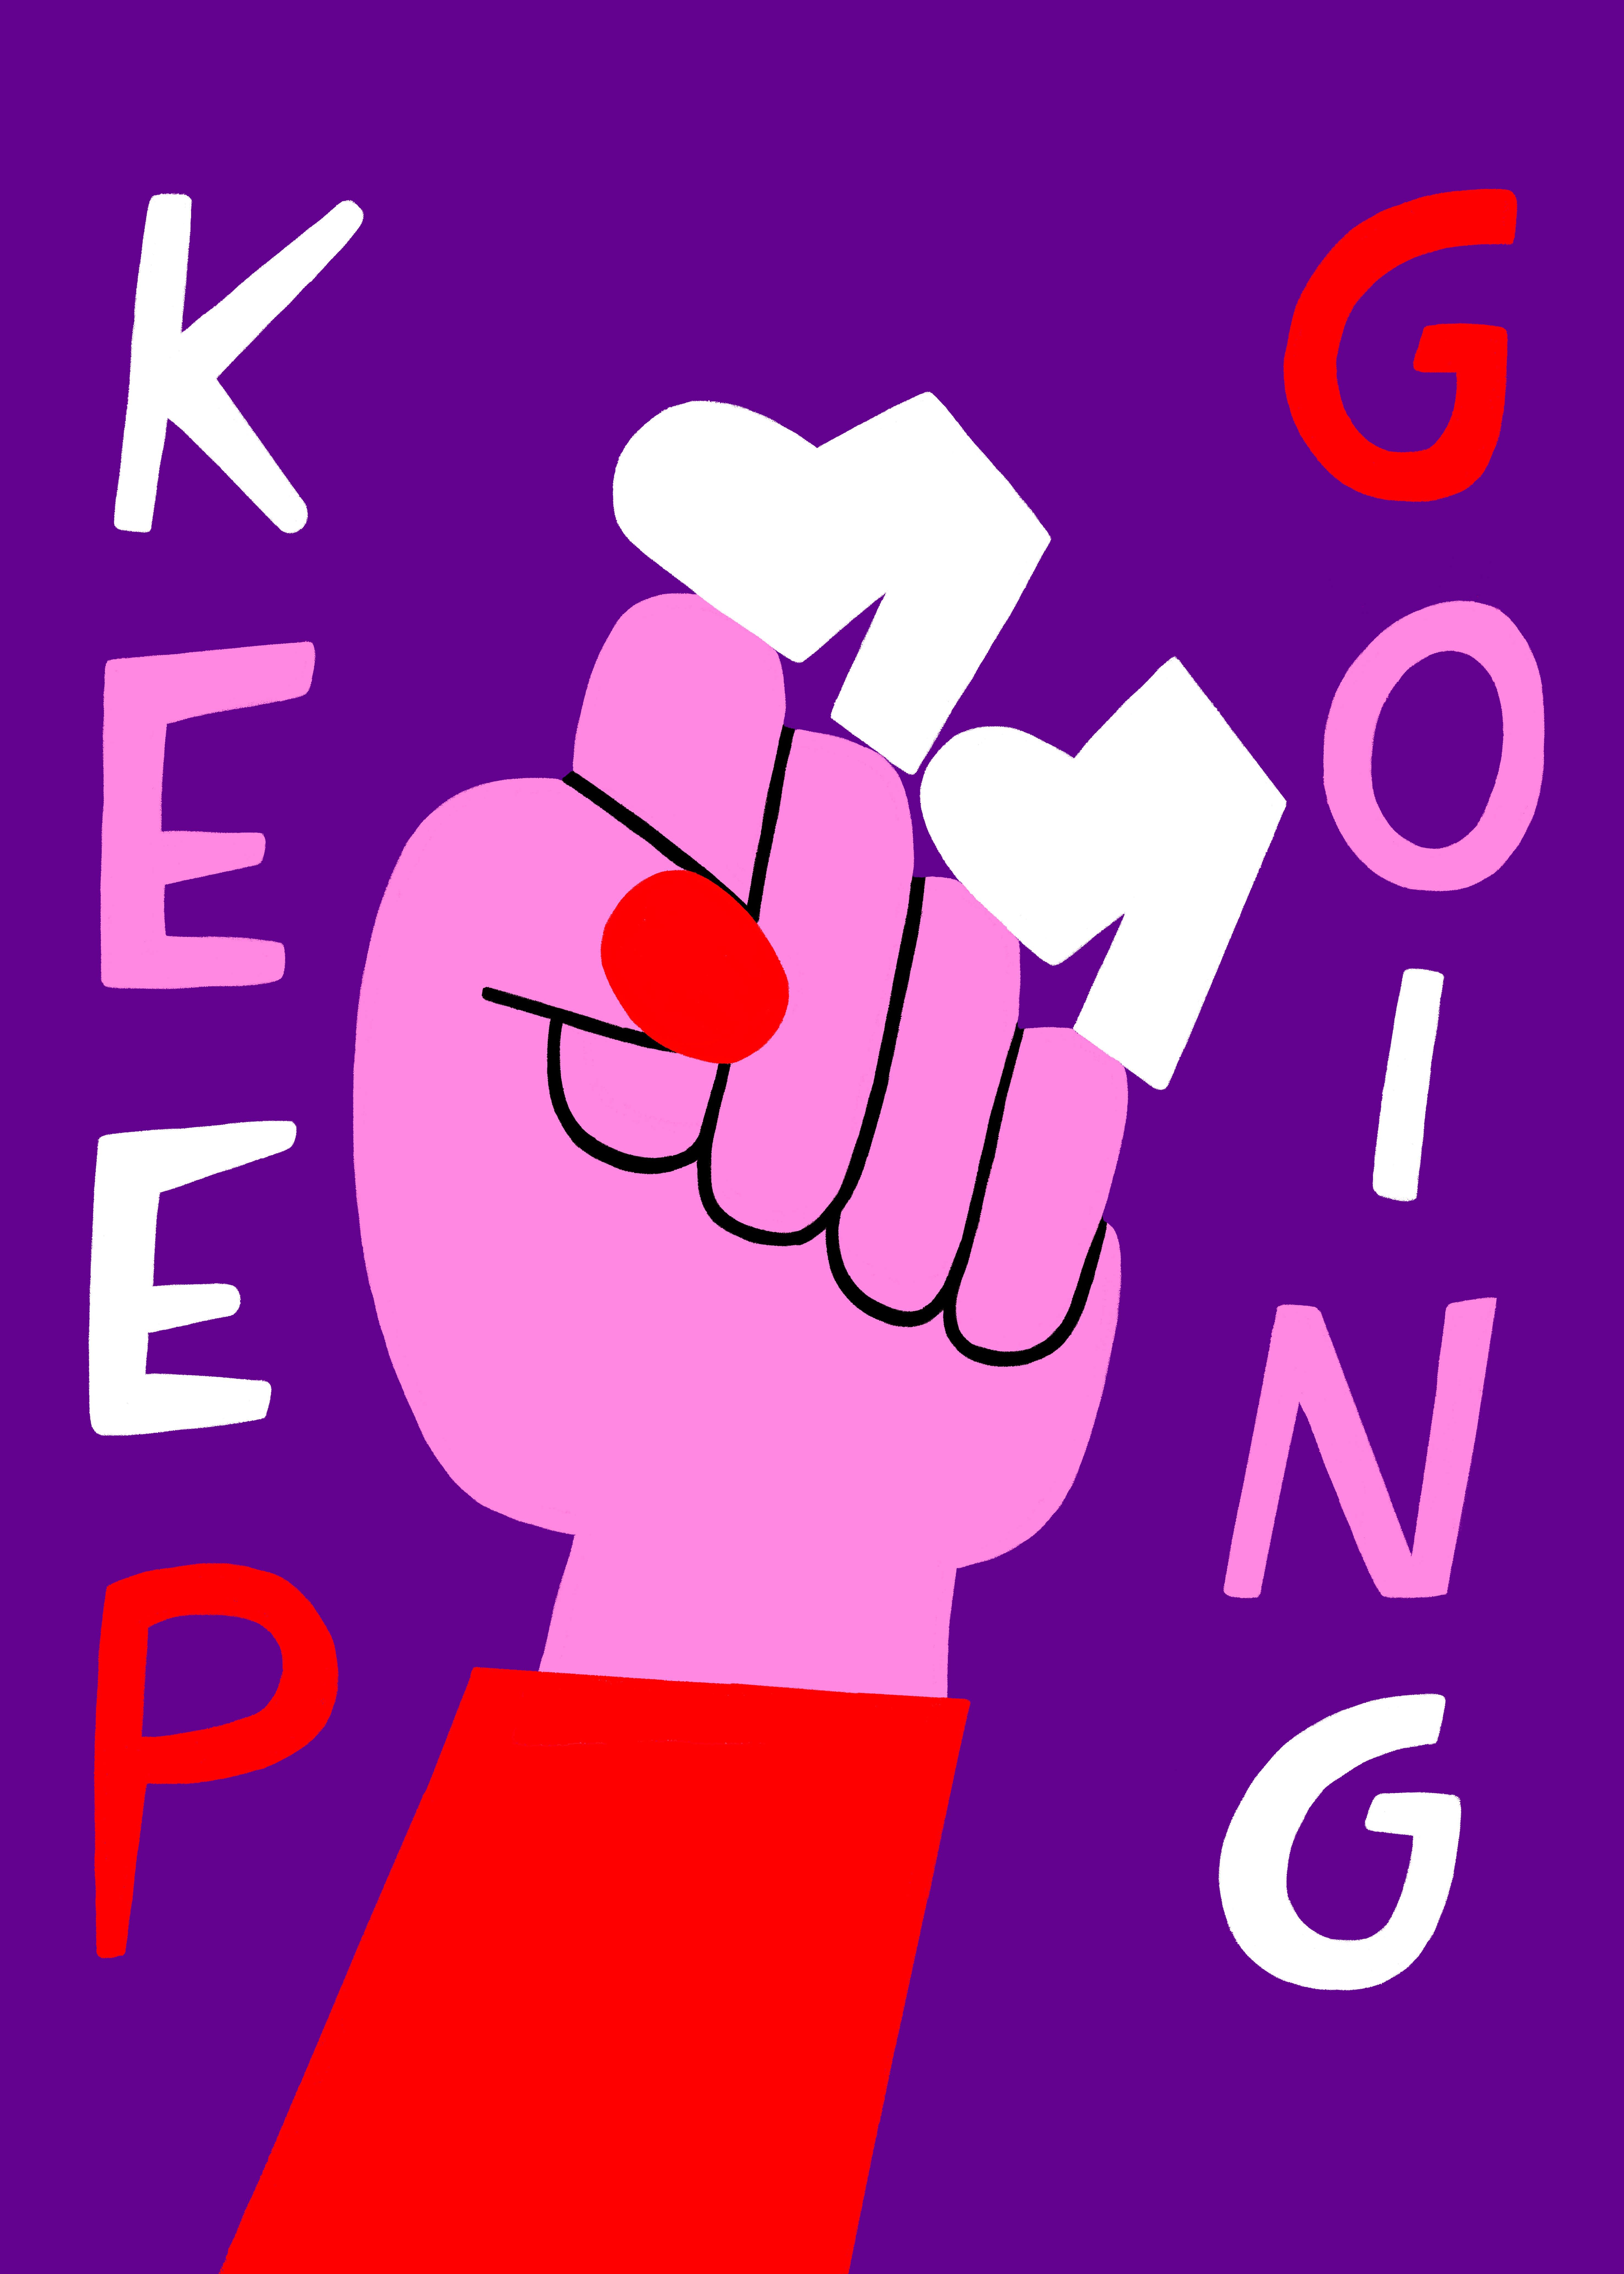 Keep Going main image